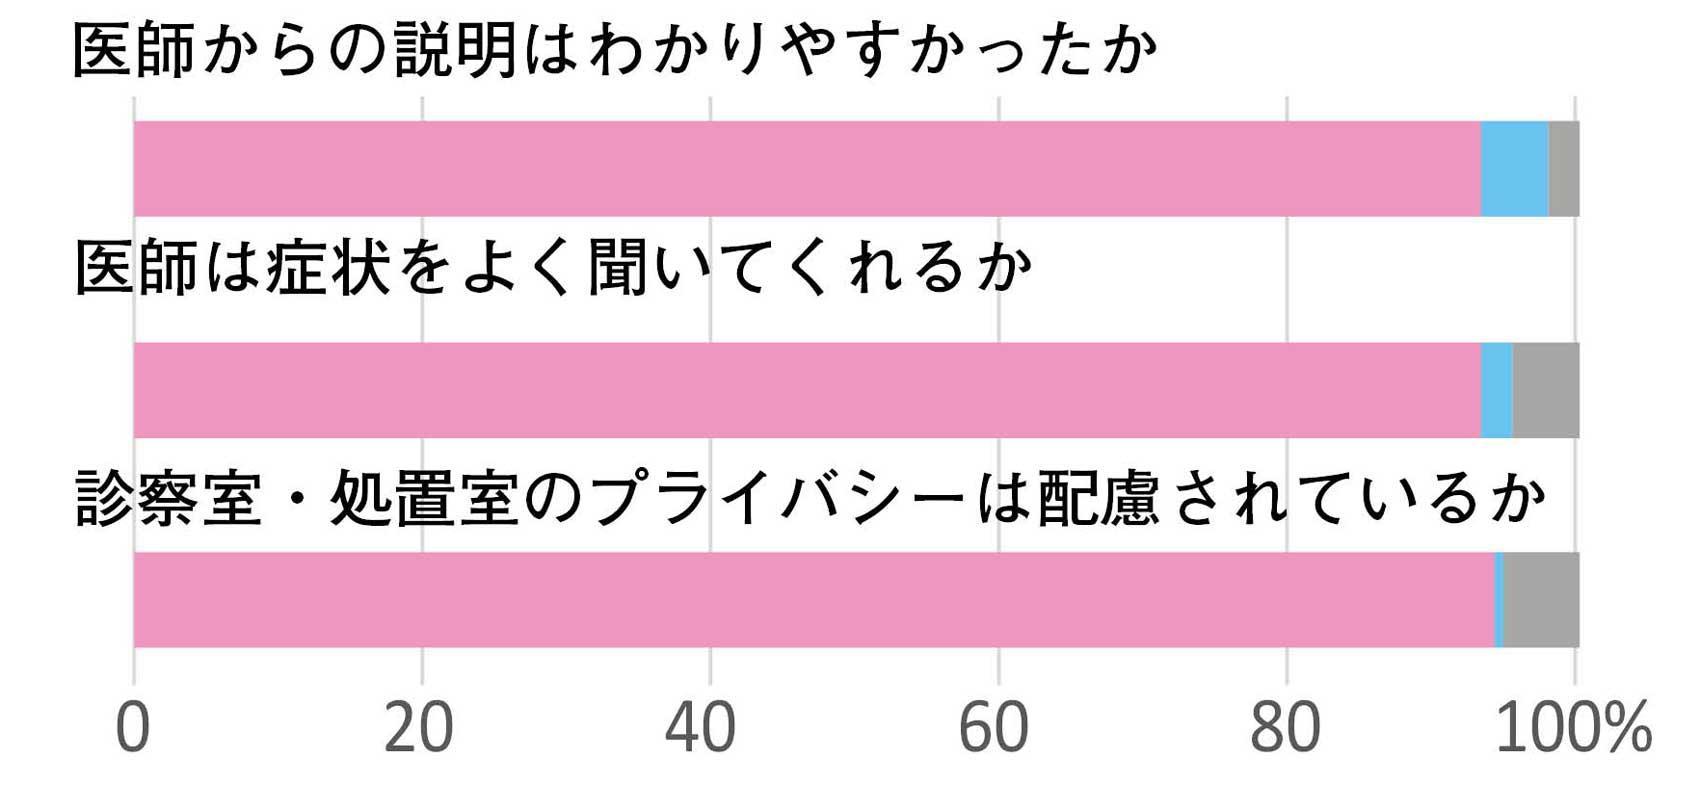 2018-sinryou_ad.jpg